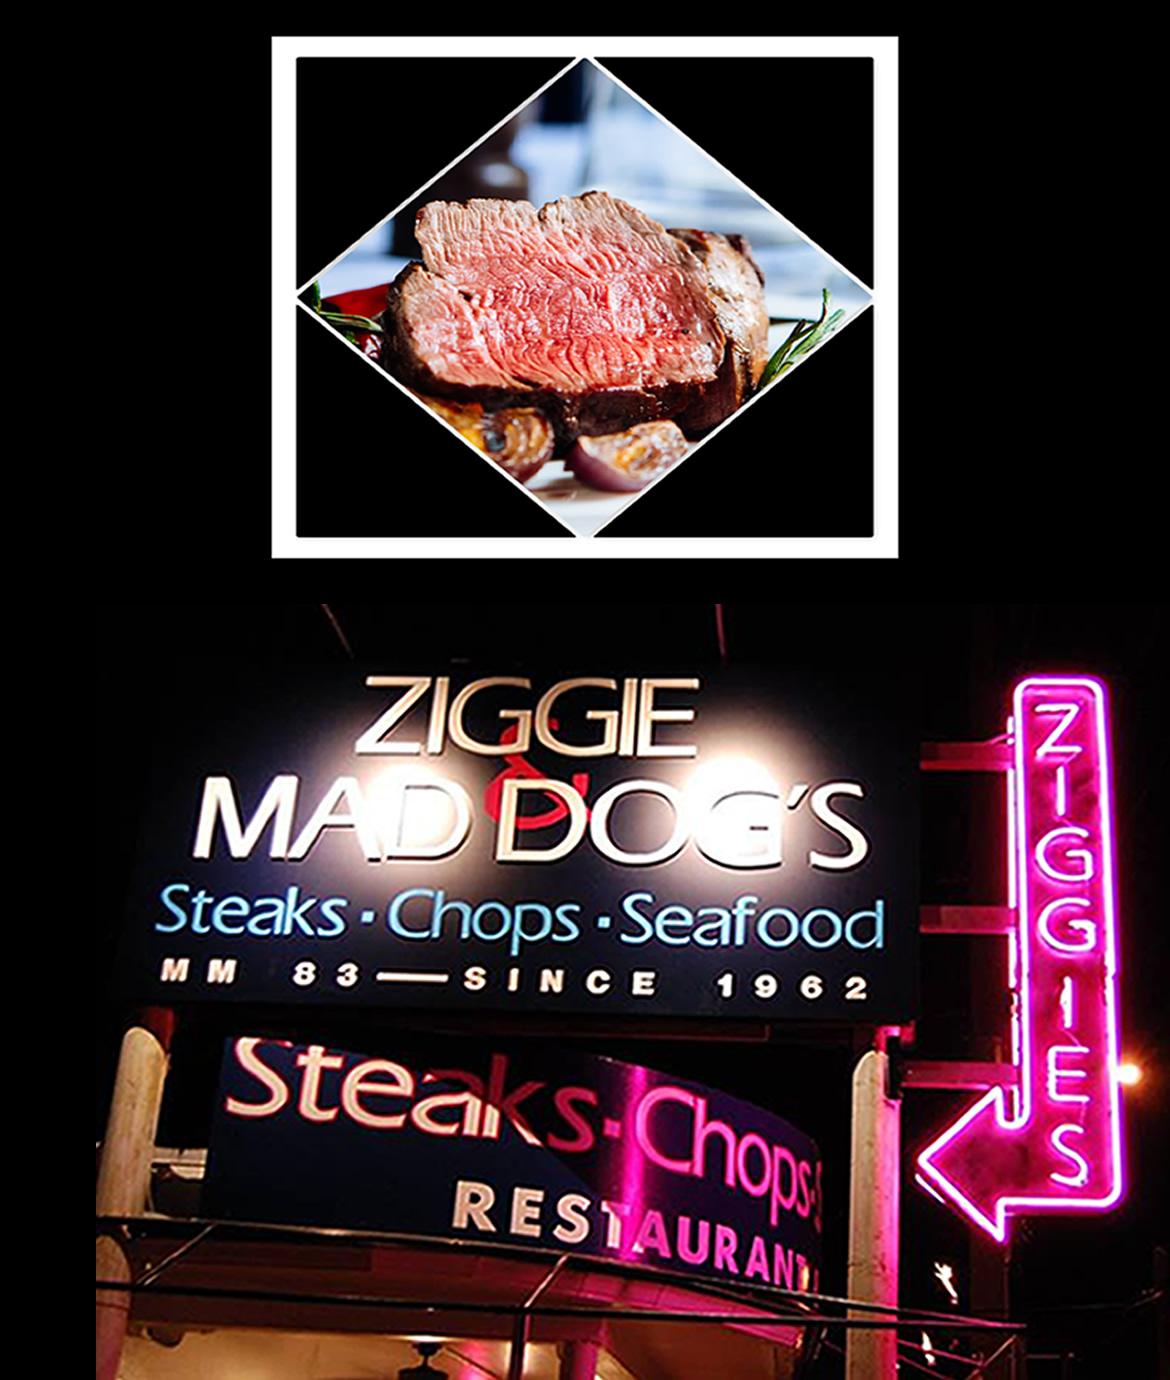 Ziggie & Mad Dog's 5 Star Steaks In The Florida Keys